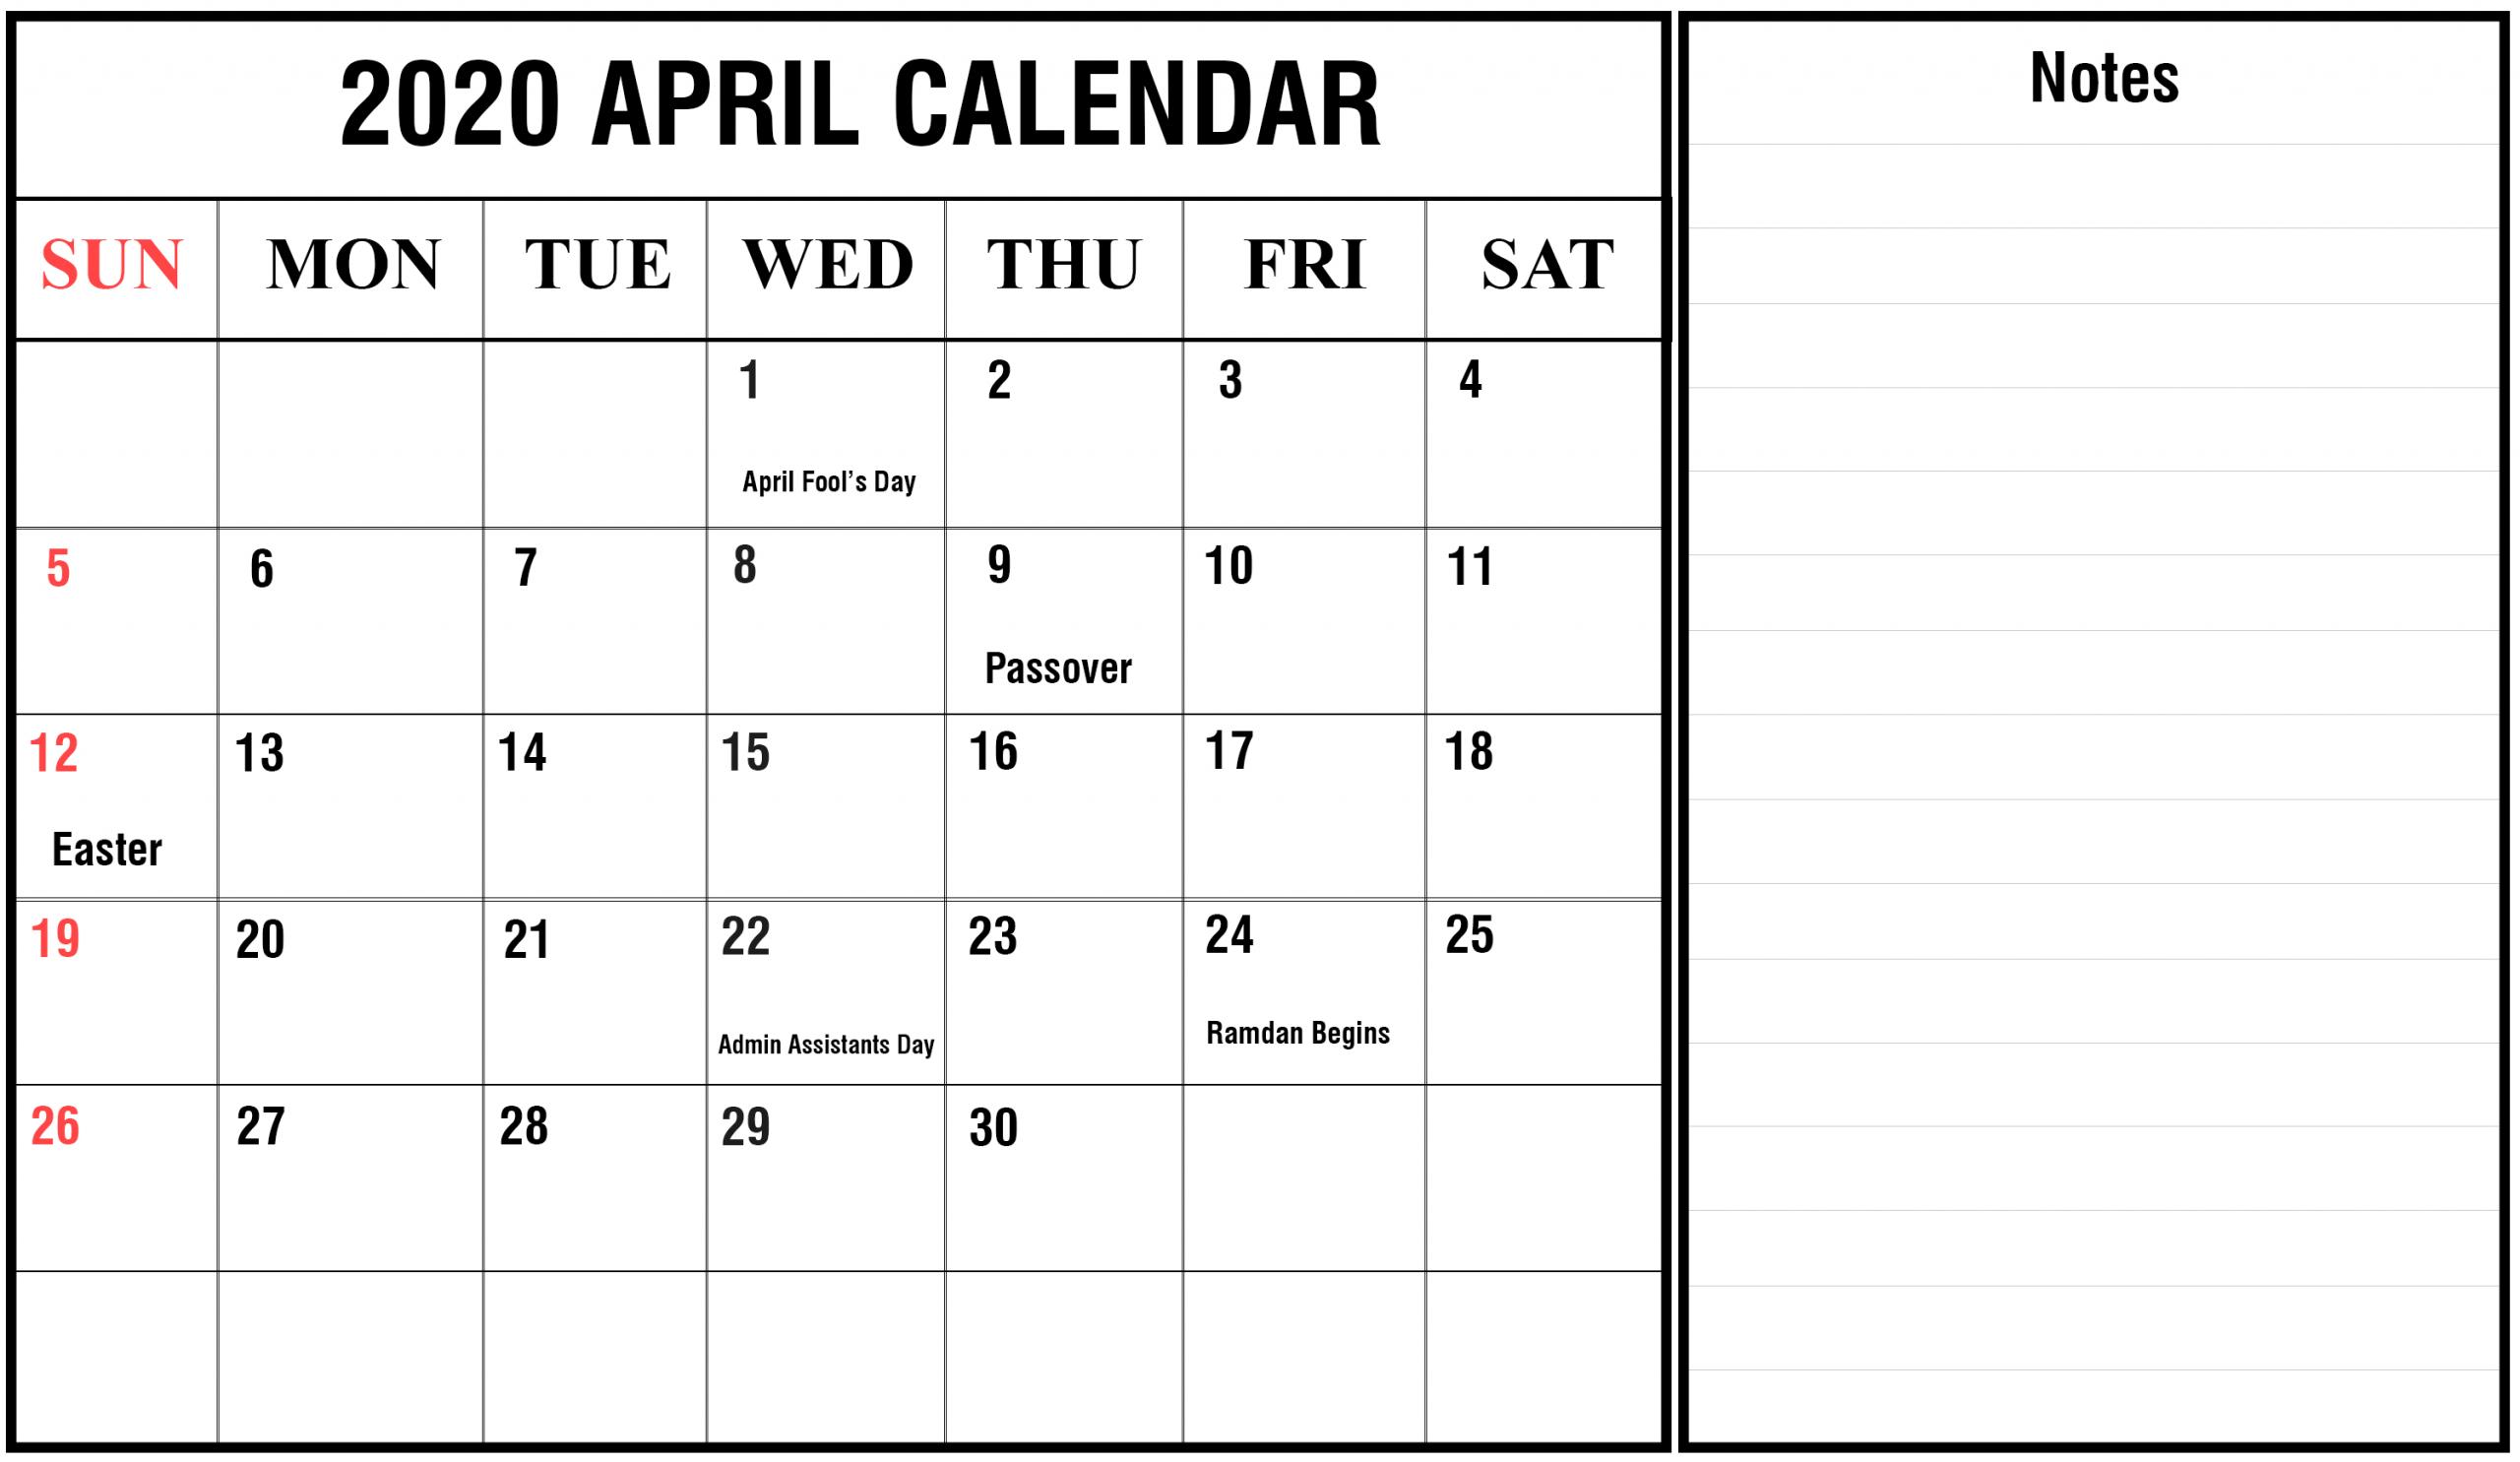 Calendars You Can Edit : Free Calendar Template Free Calendars That I Can Edit And Print